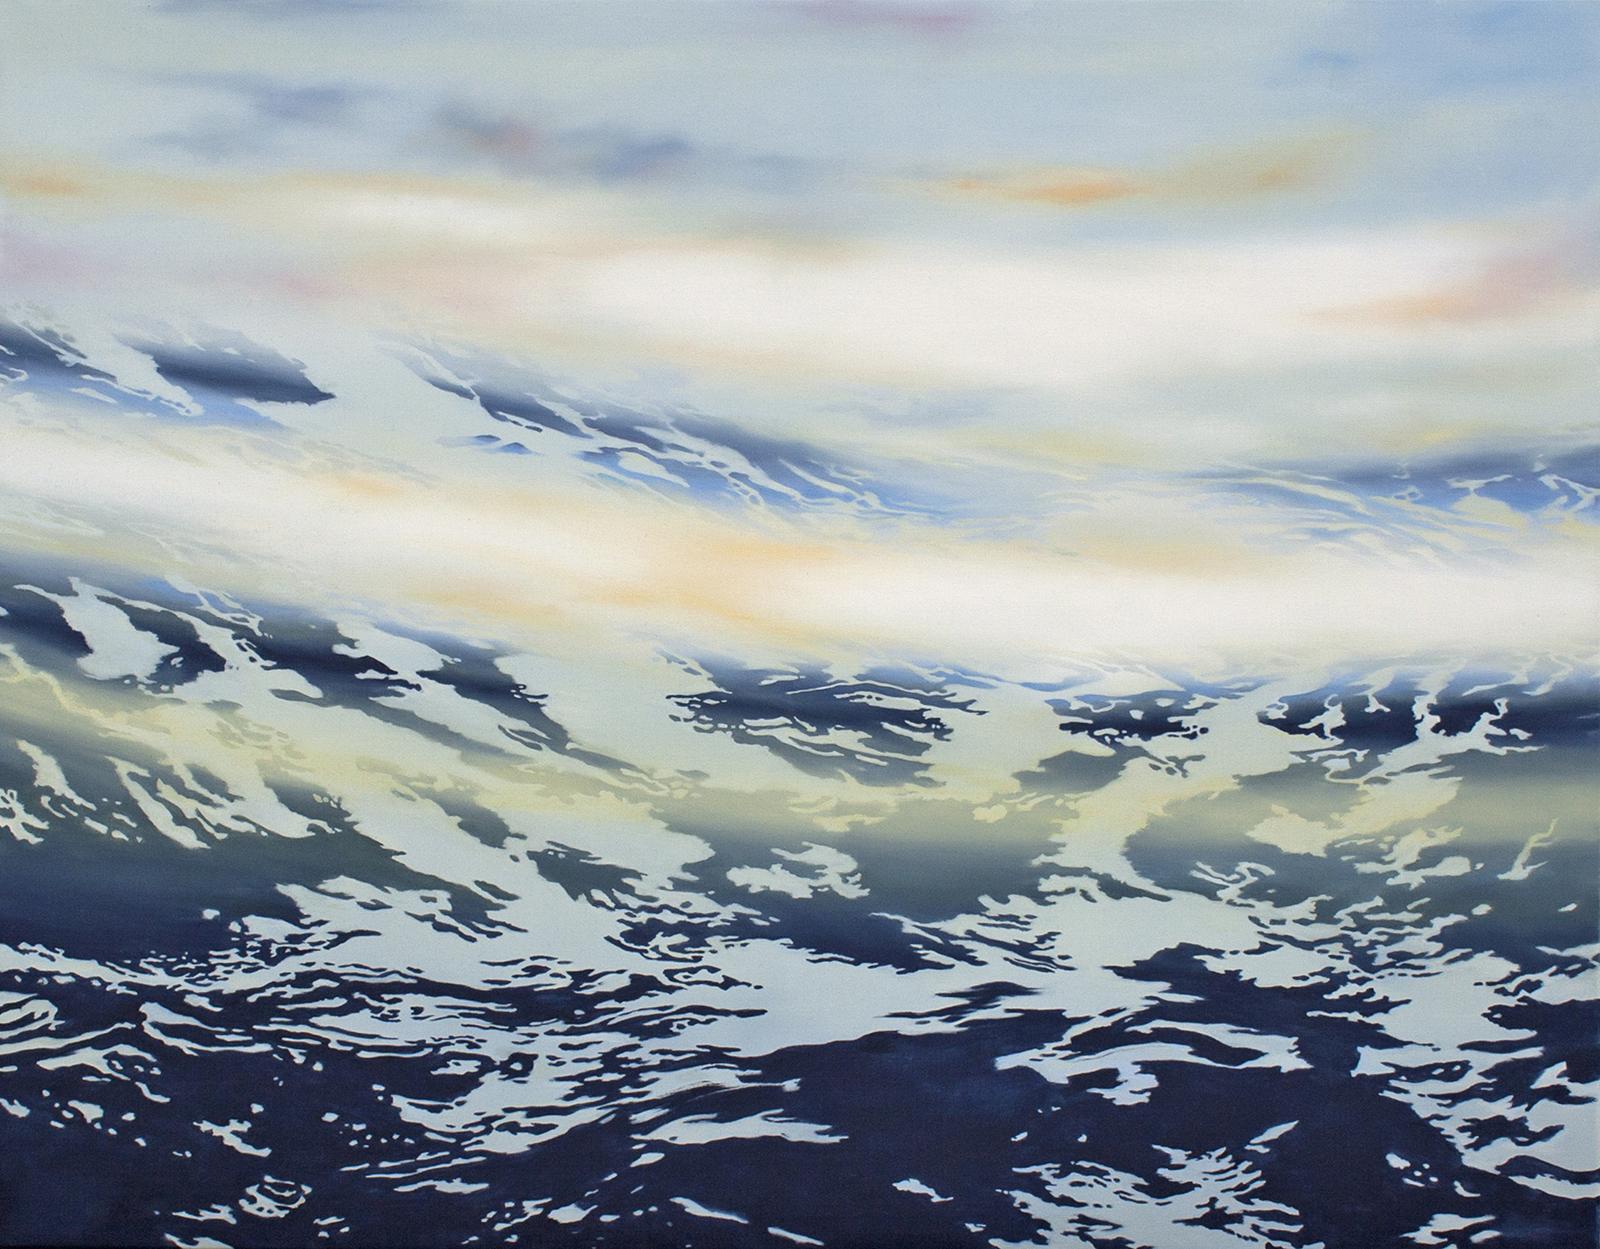 Höhenzug 2013, 120 x 150 cm, Öl auf Leinwand  Mountain Ridge 2013